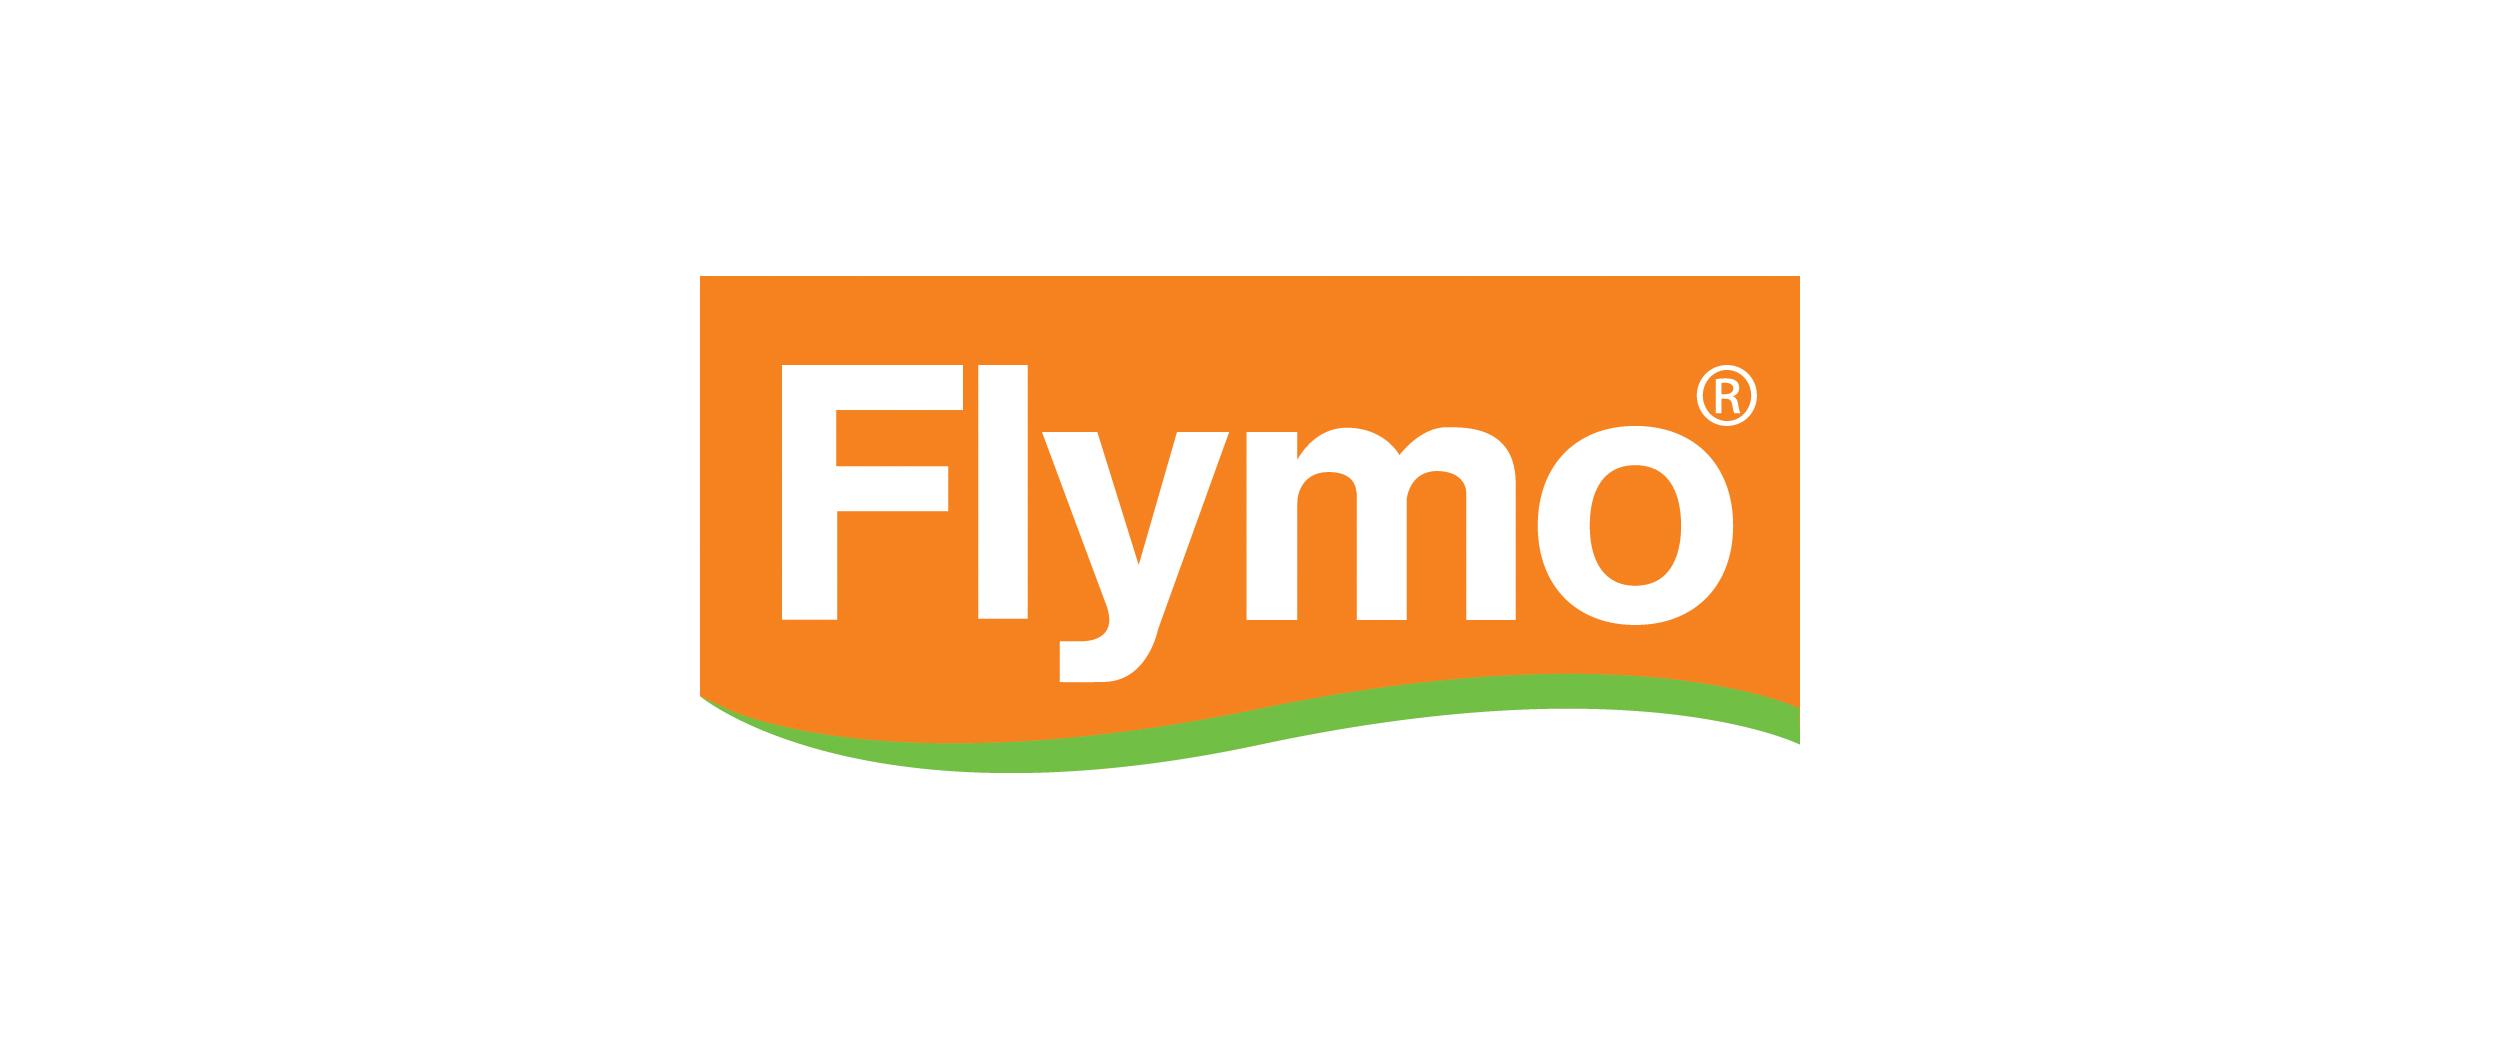 Flymo_Logo.jpg